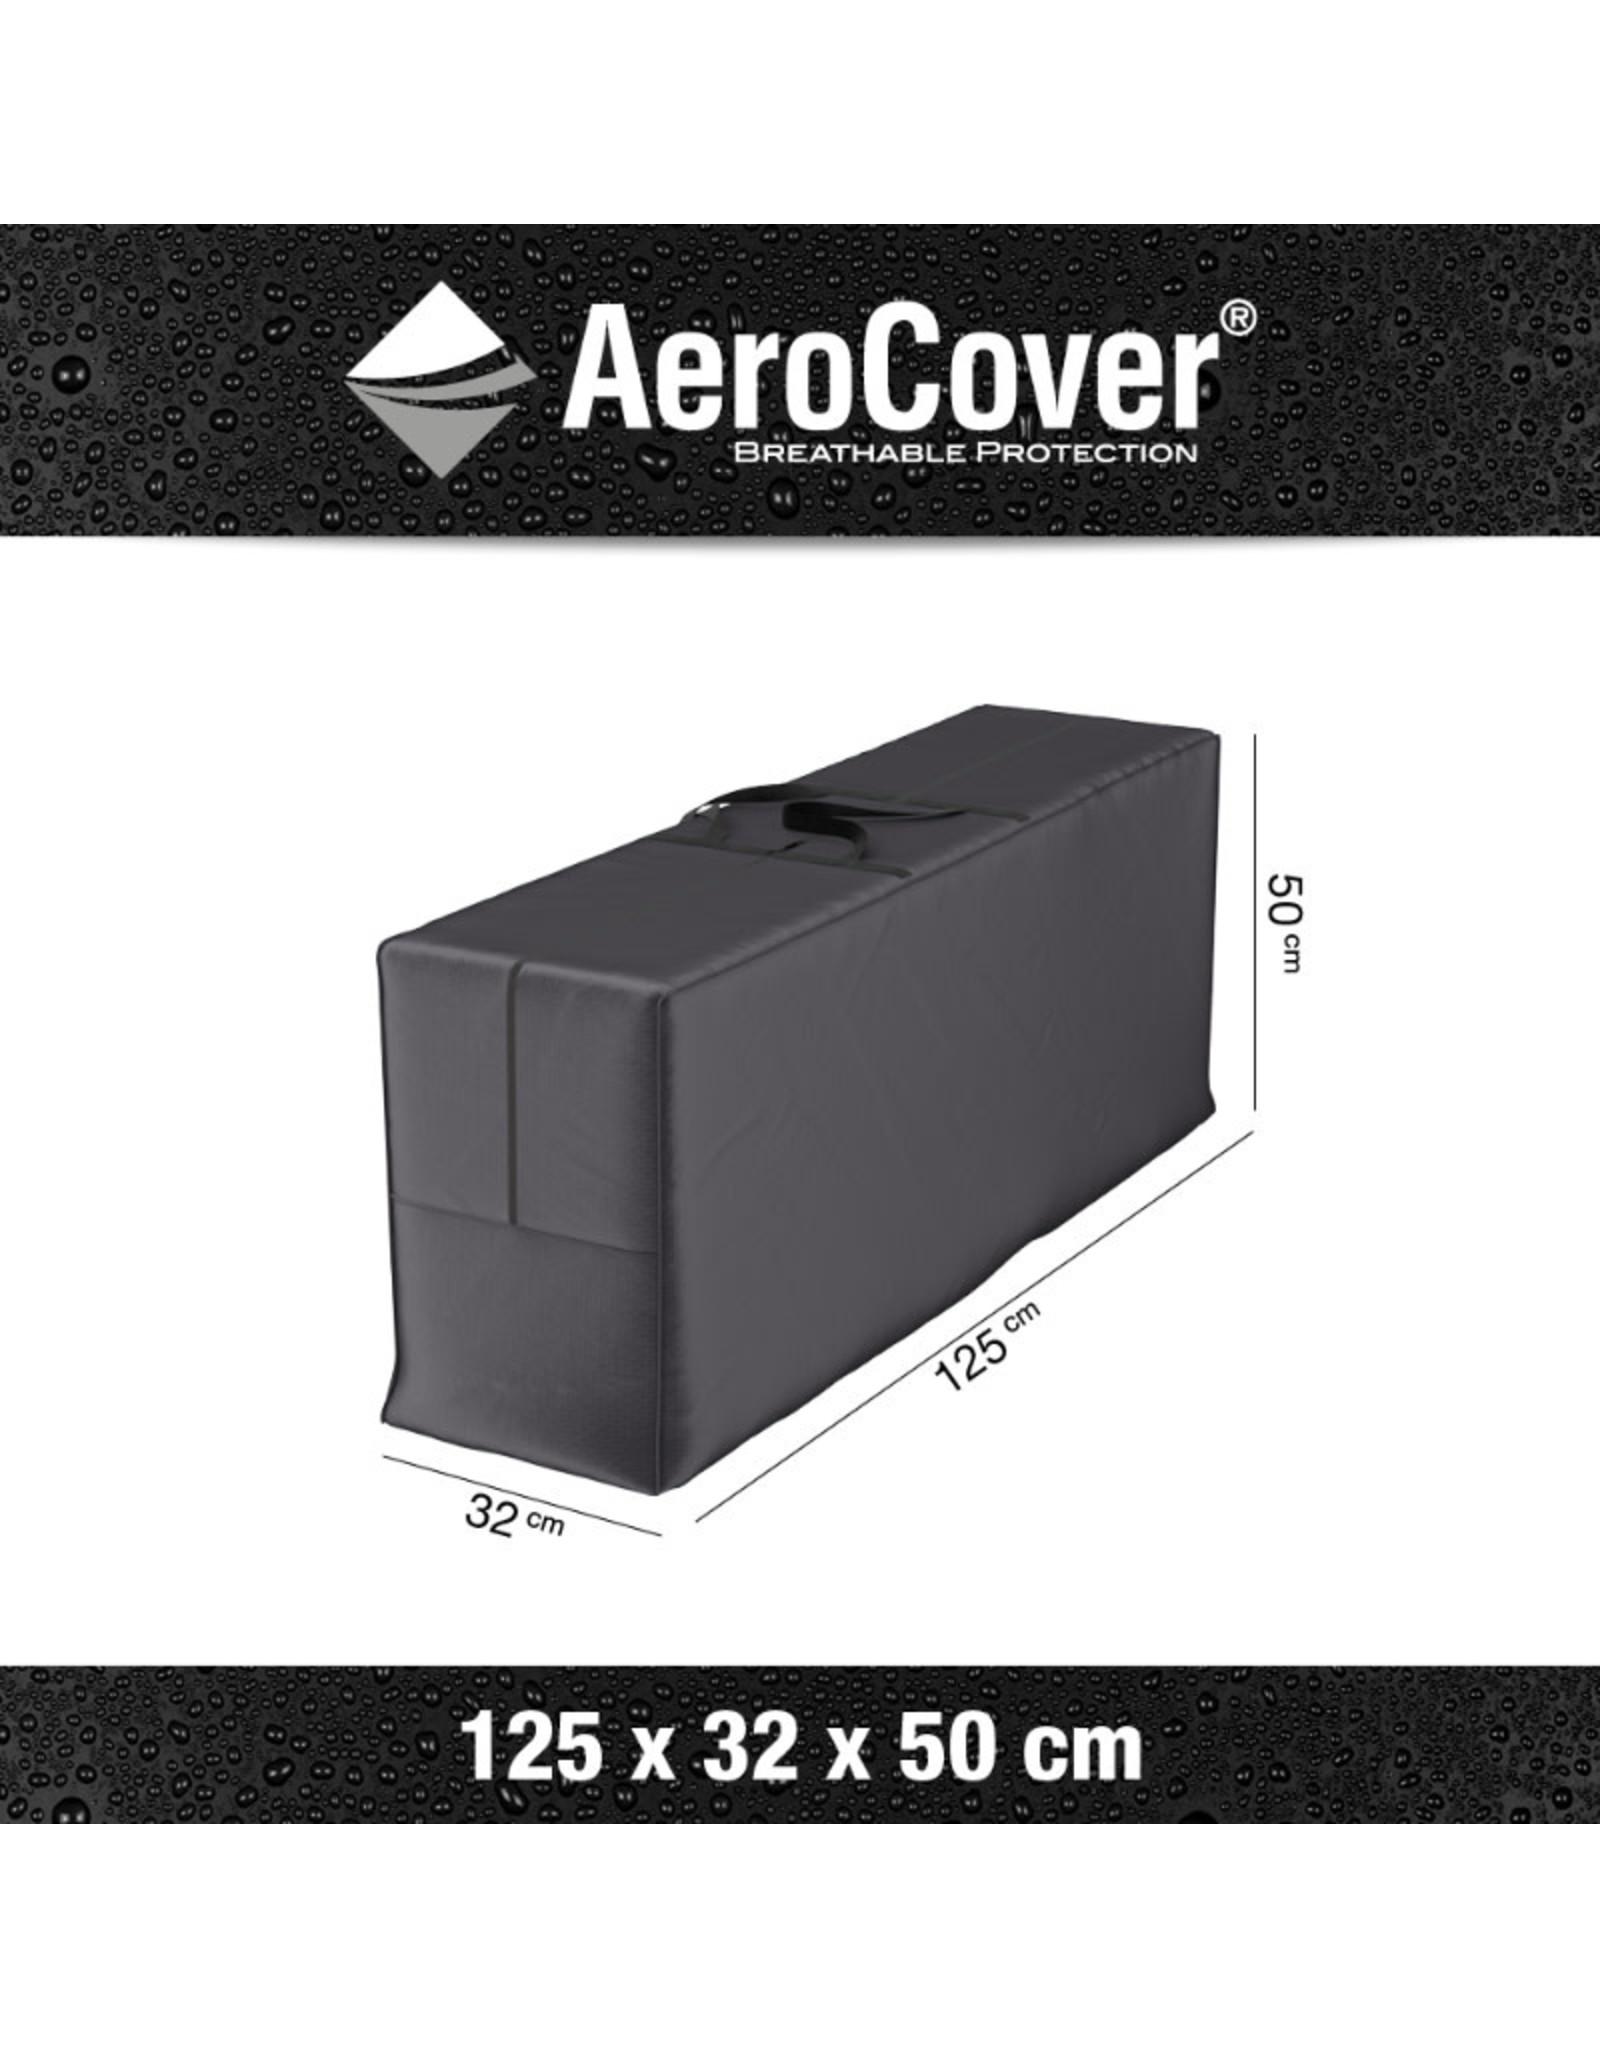 Aerocover Cushion bags from Aerocover 125x32xH50